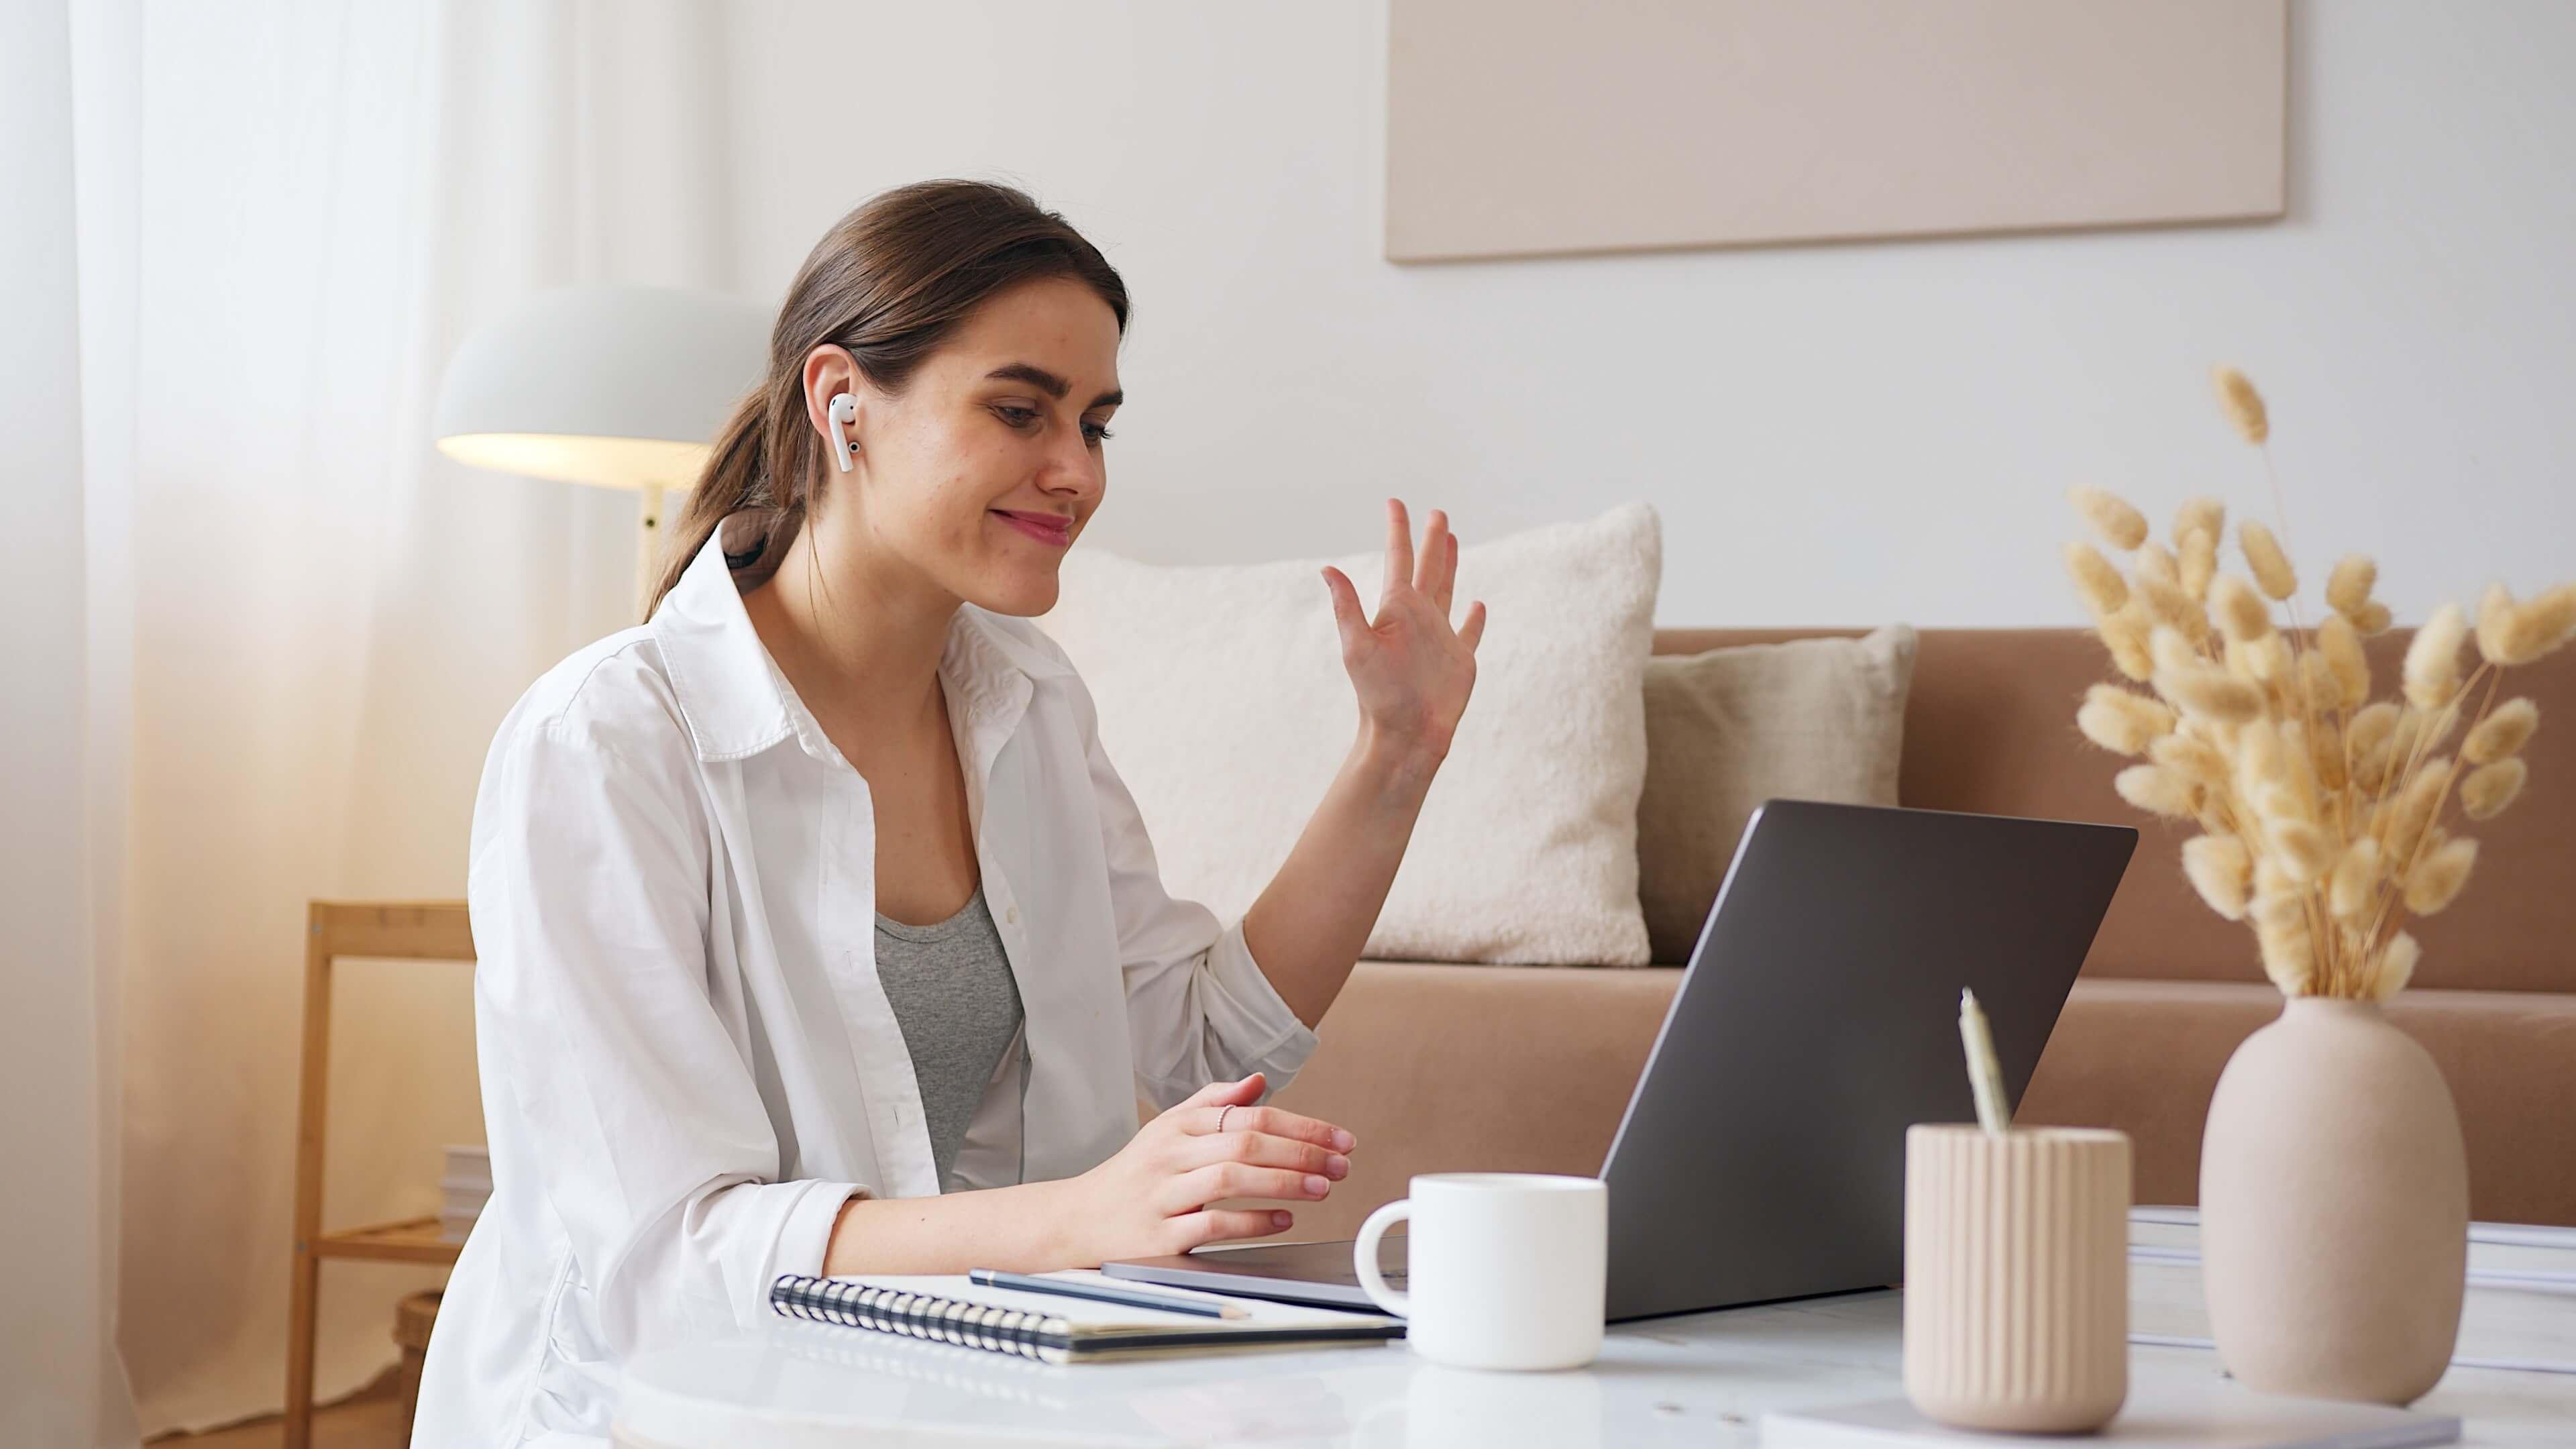 girl waving at the laptop webcam